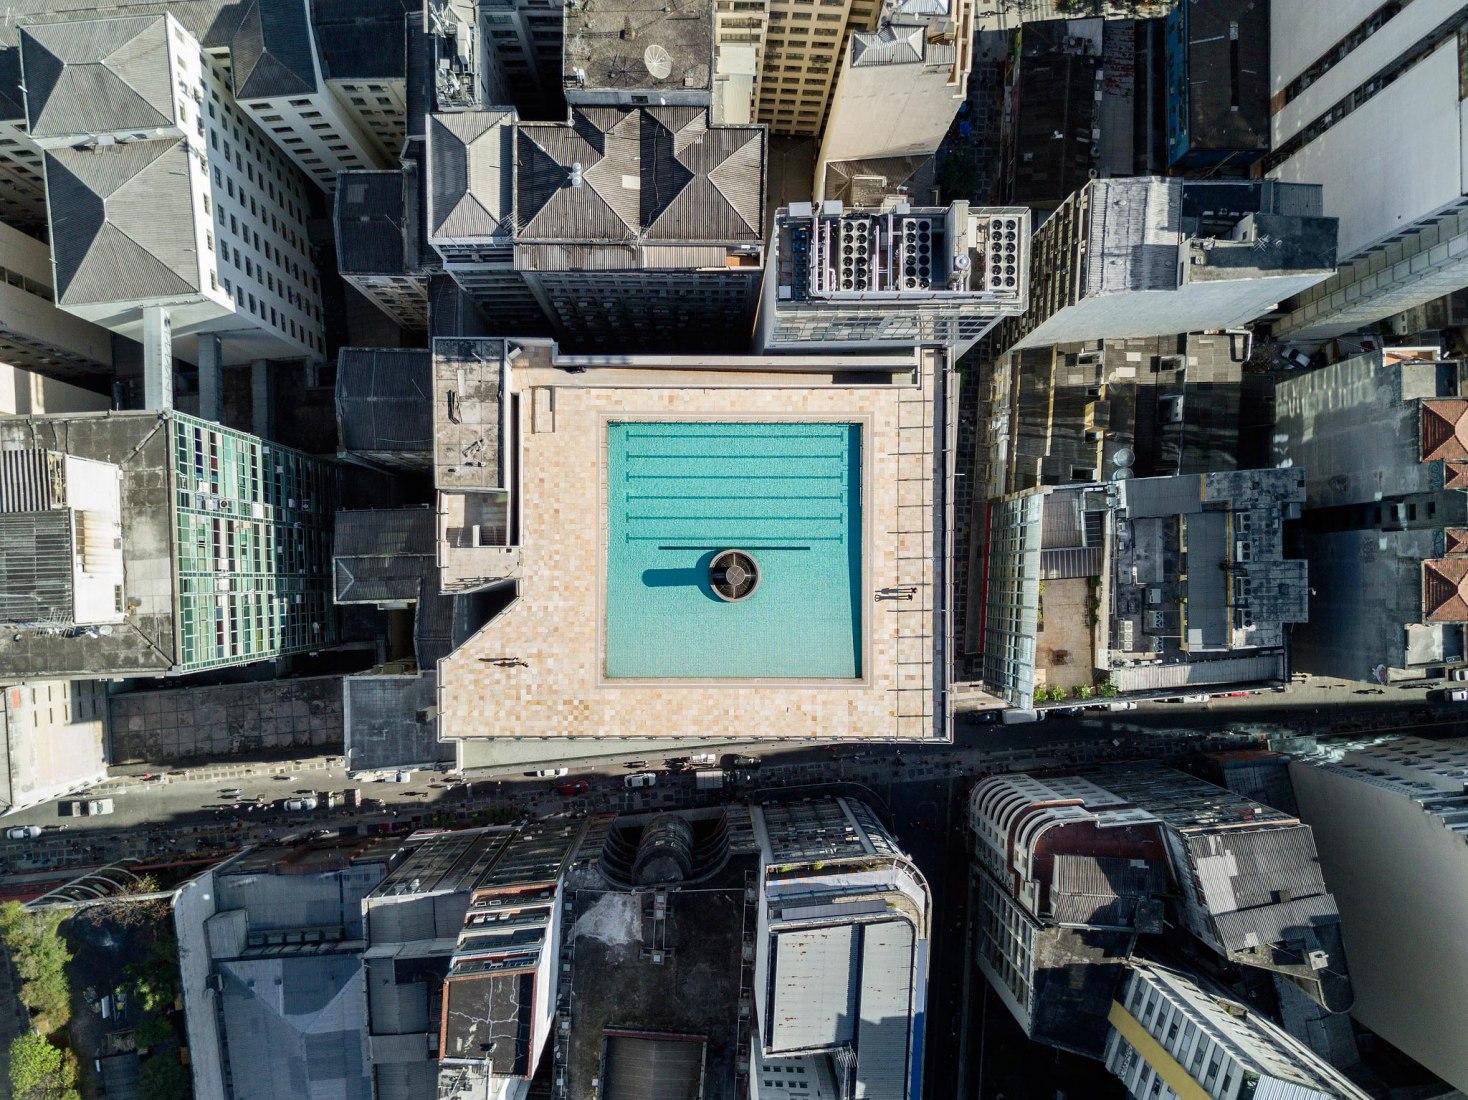 Aerial view. Paulo Mendes da Rocha and MMBB's Newest SESC Franchise in São Paulo. Photograph © Leonardo Finotti. Image courtesy Sesc 24 de Maio